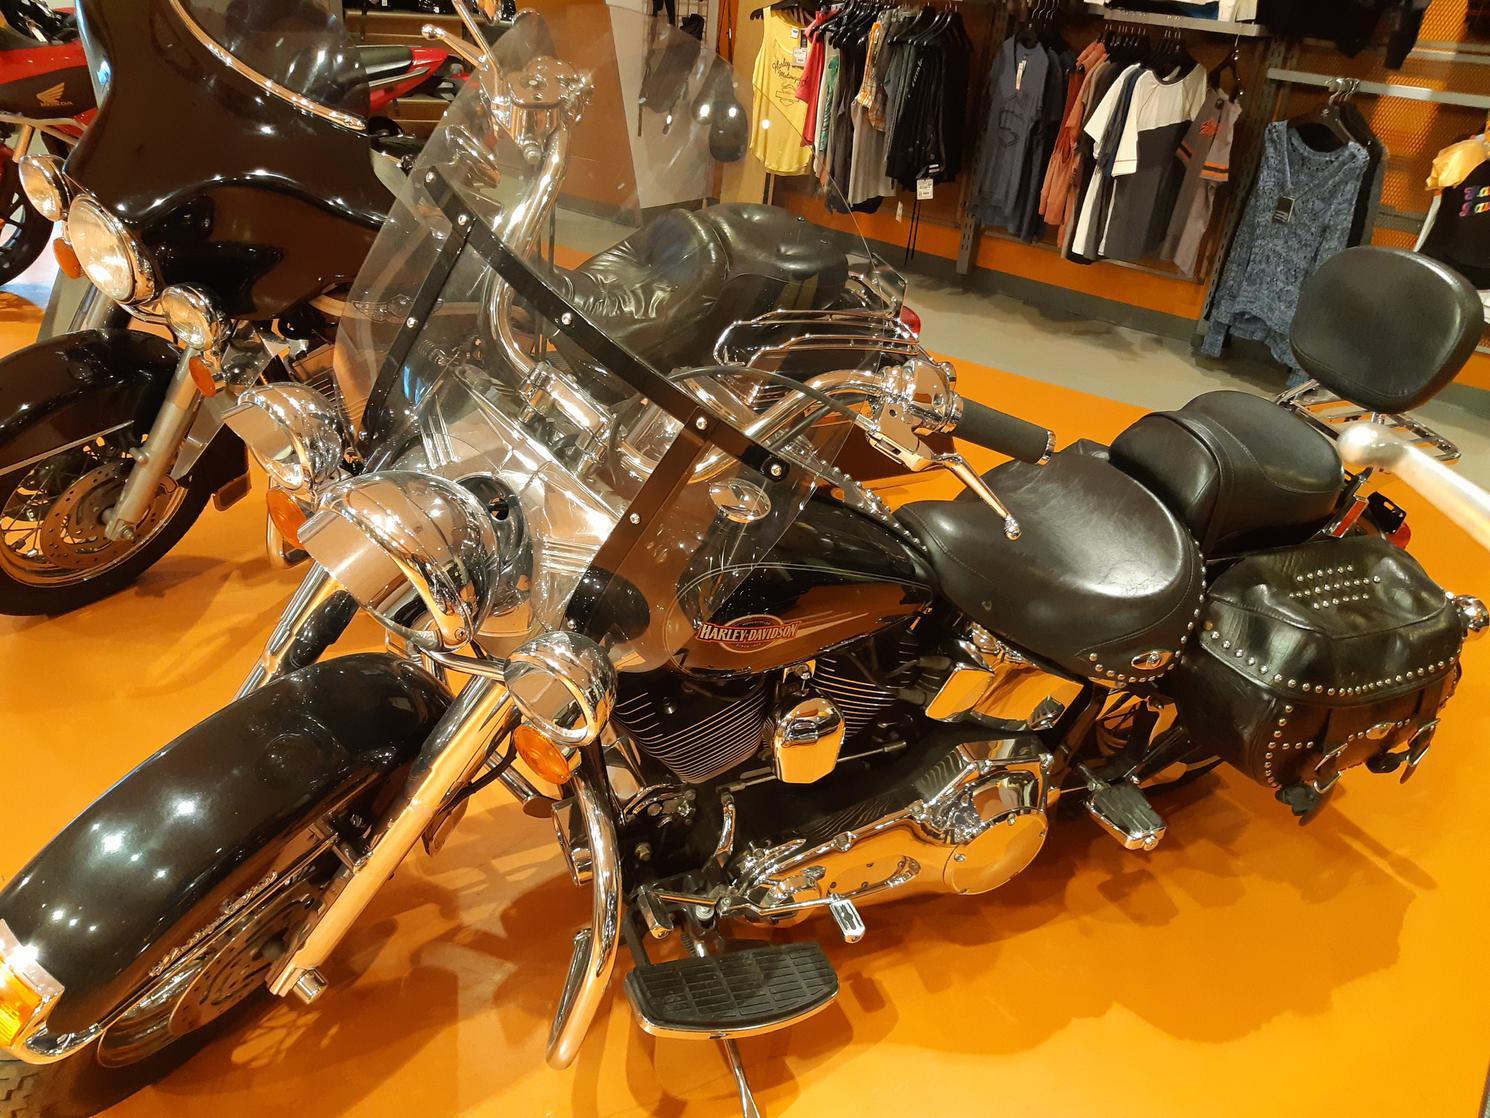 2005 Harley Davidson FLSTCI